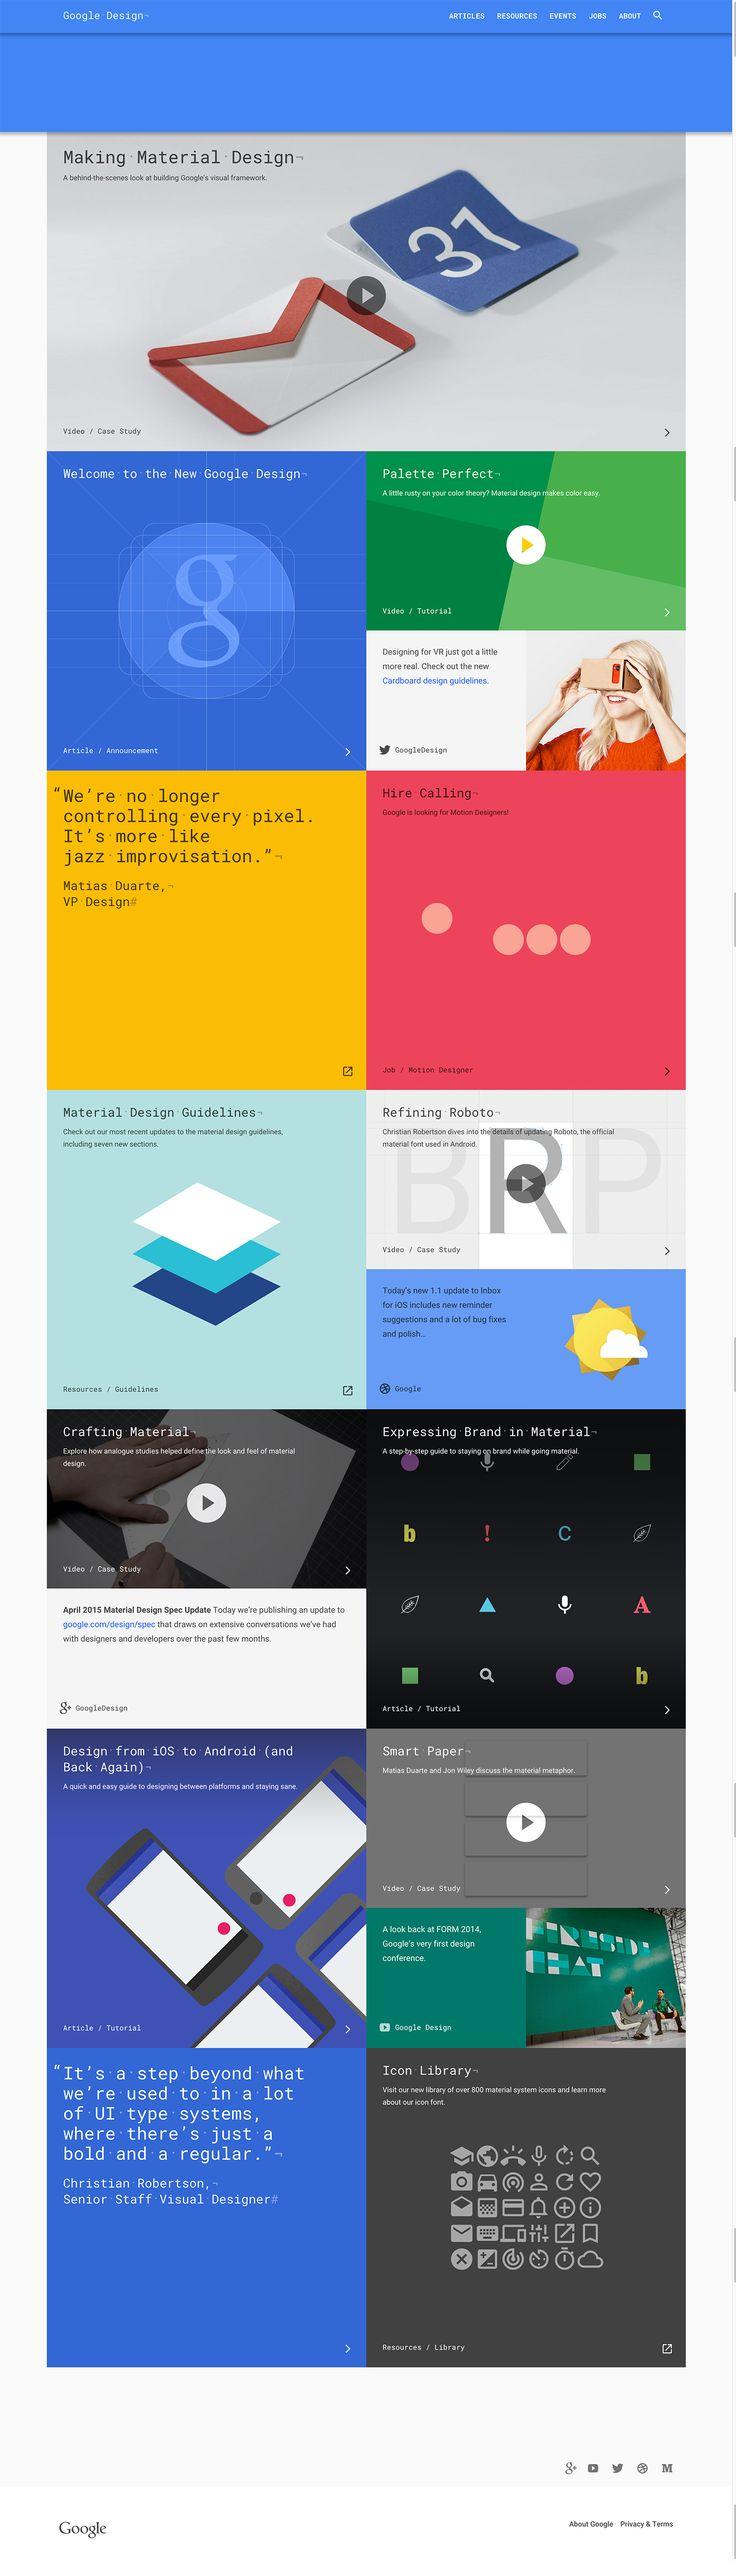 New Google Design materialdesign